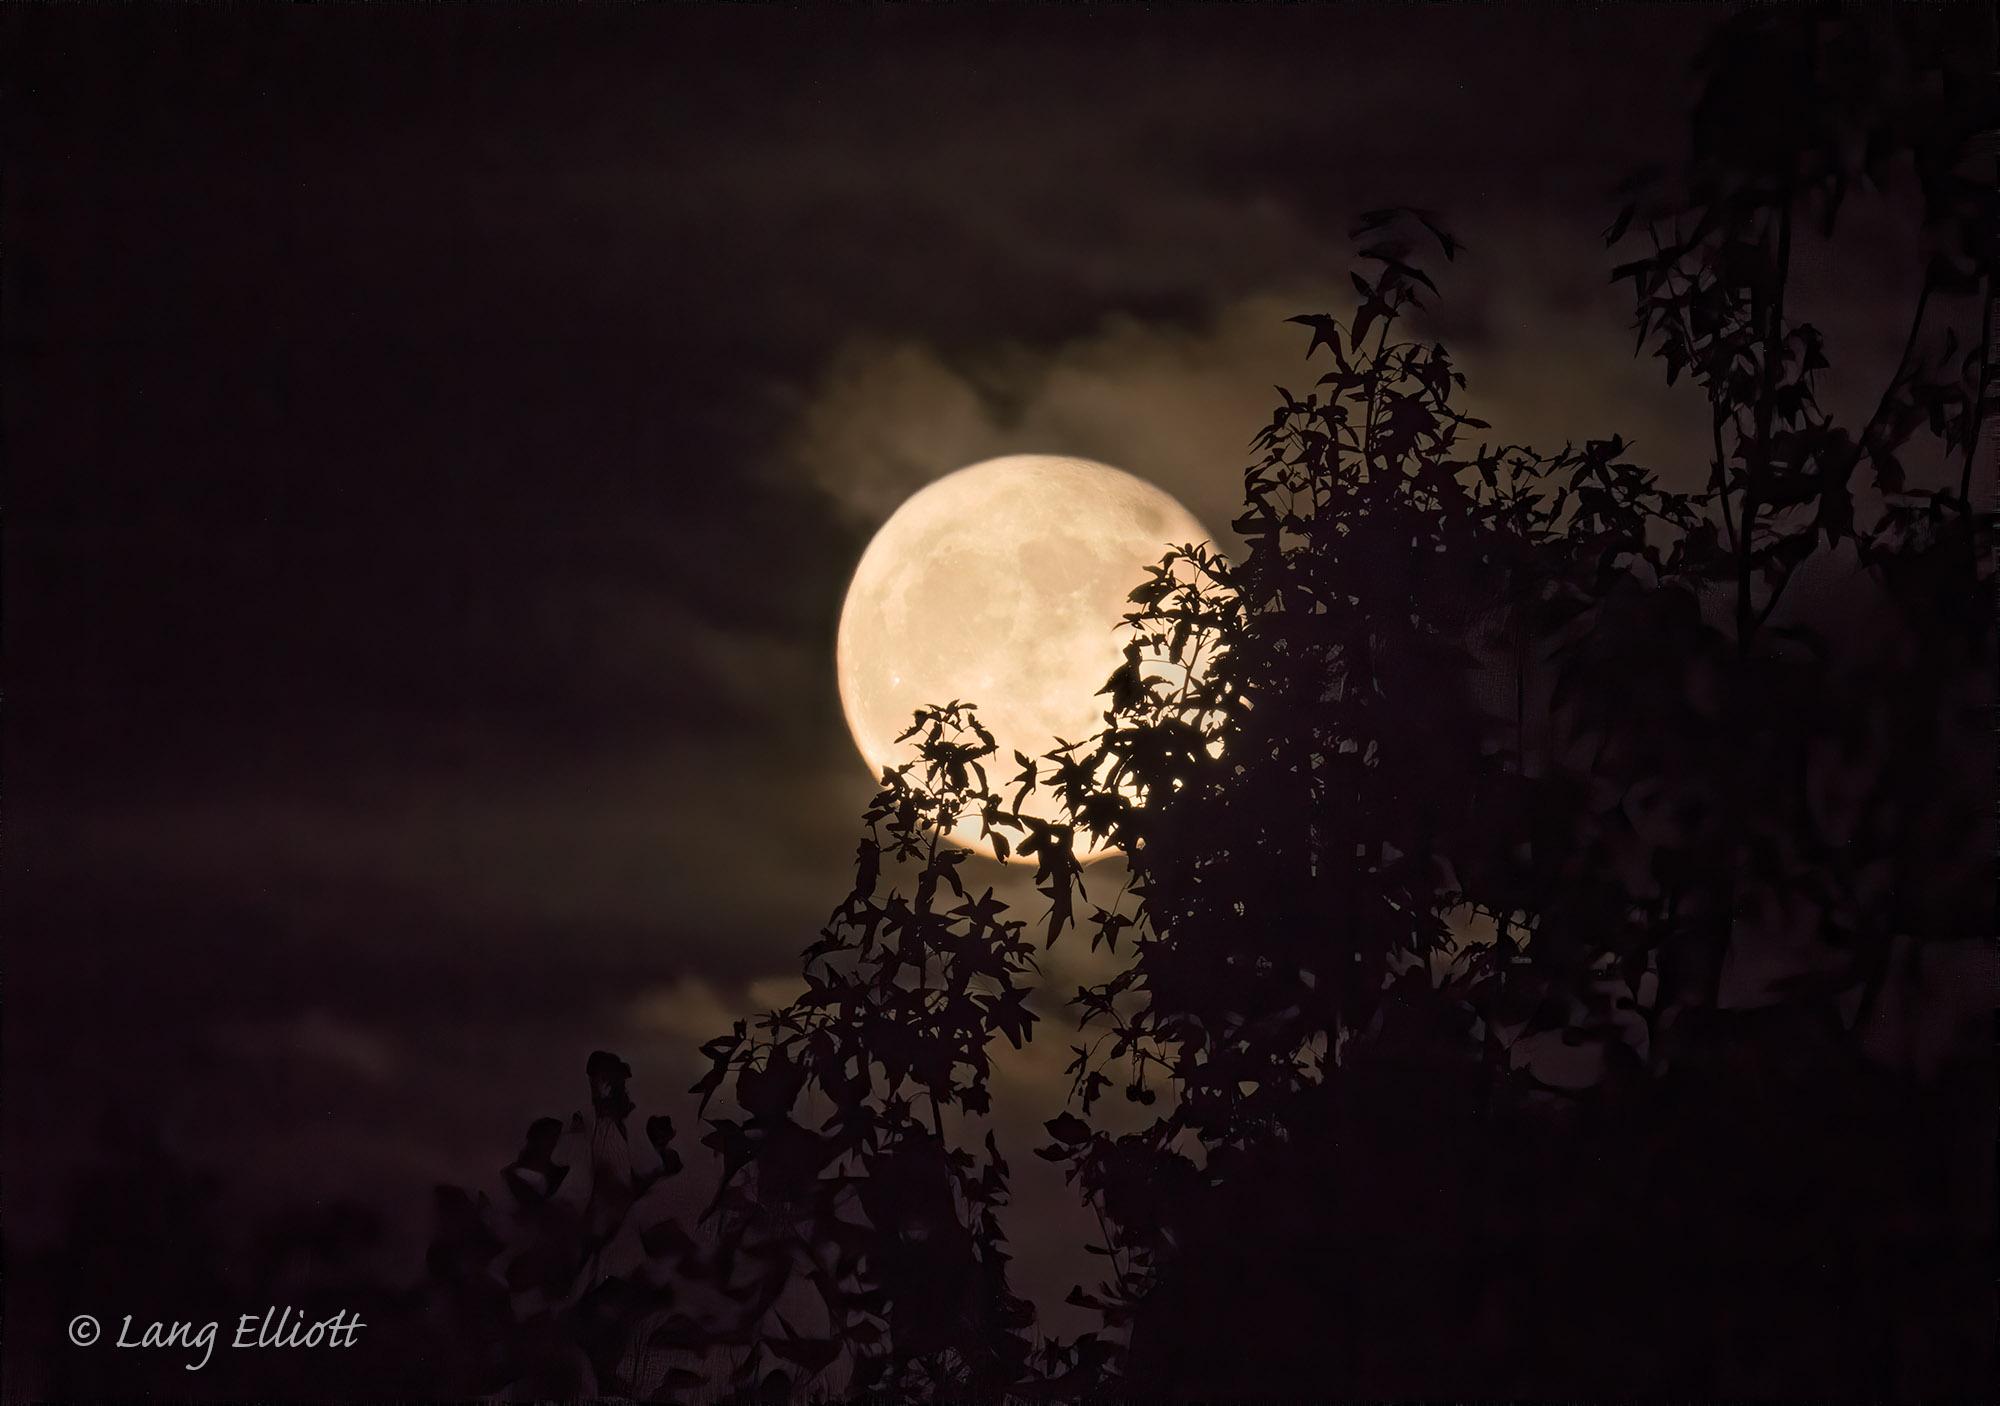 Full moon at Land Between the Lakes © Lang Elliott